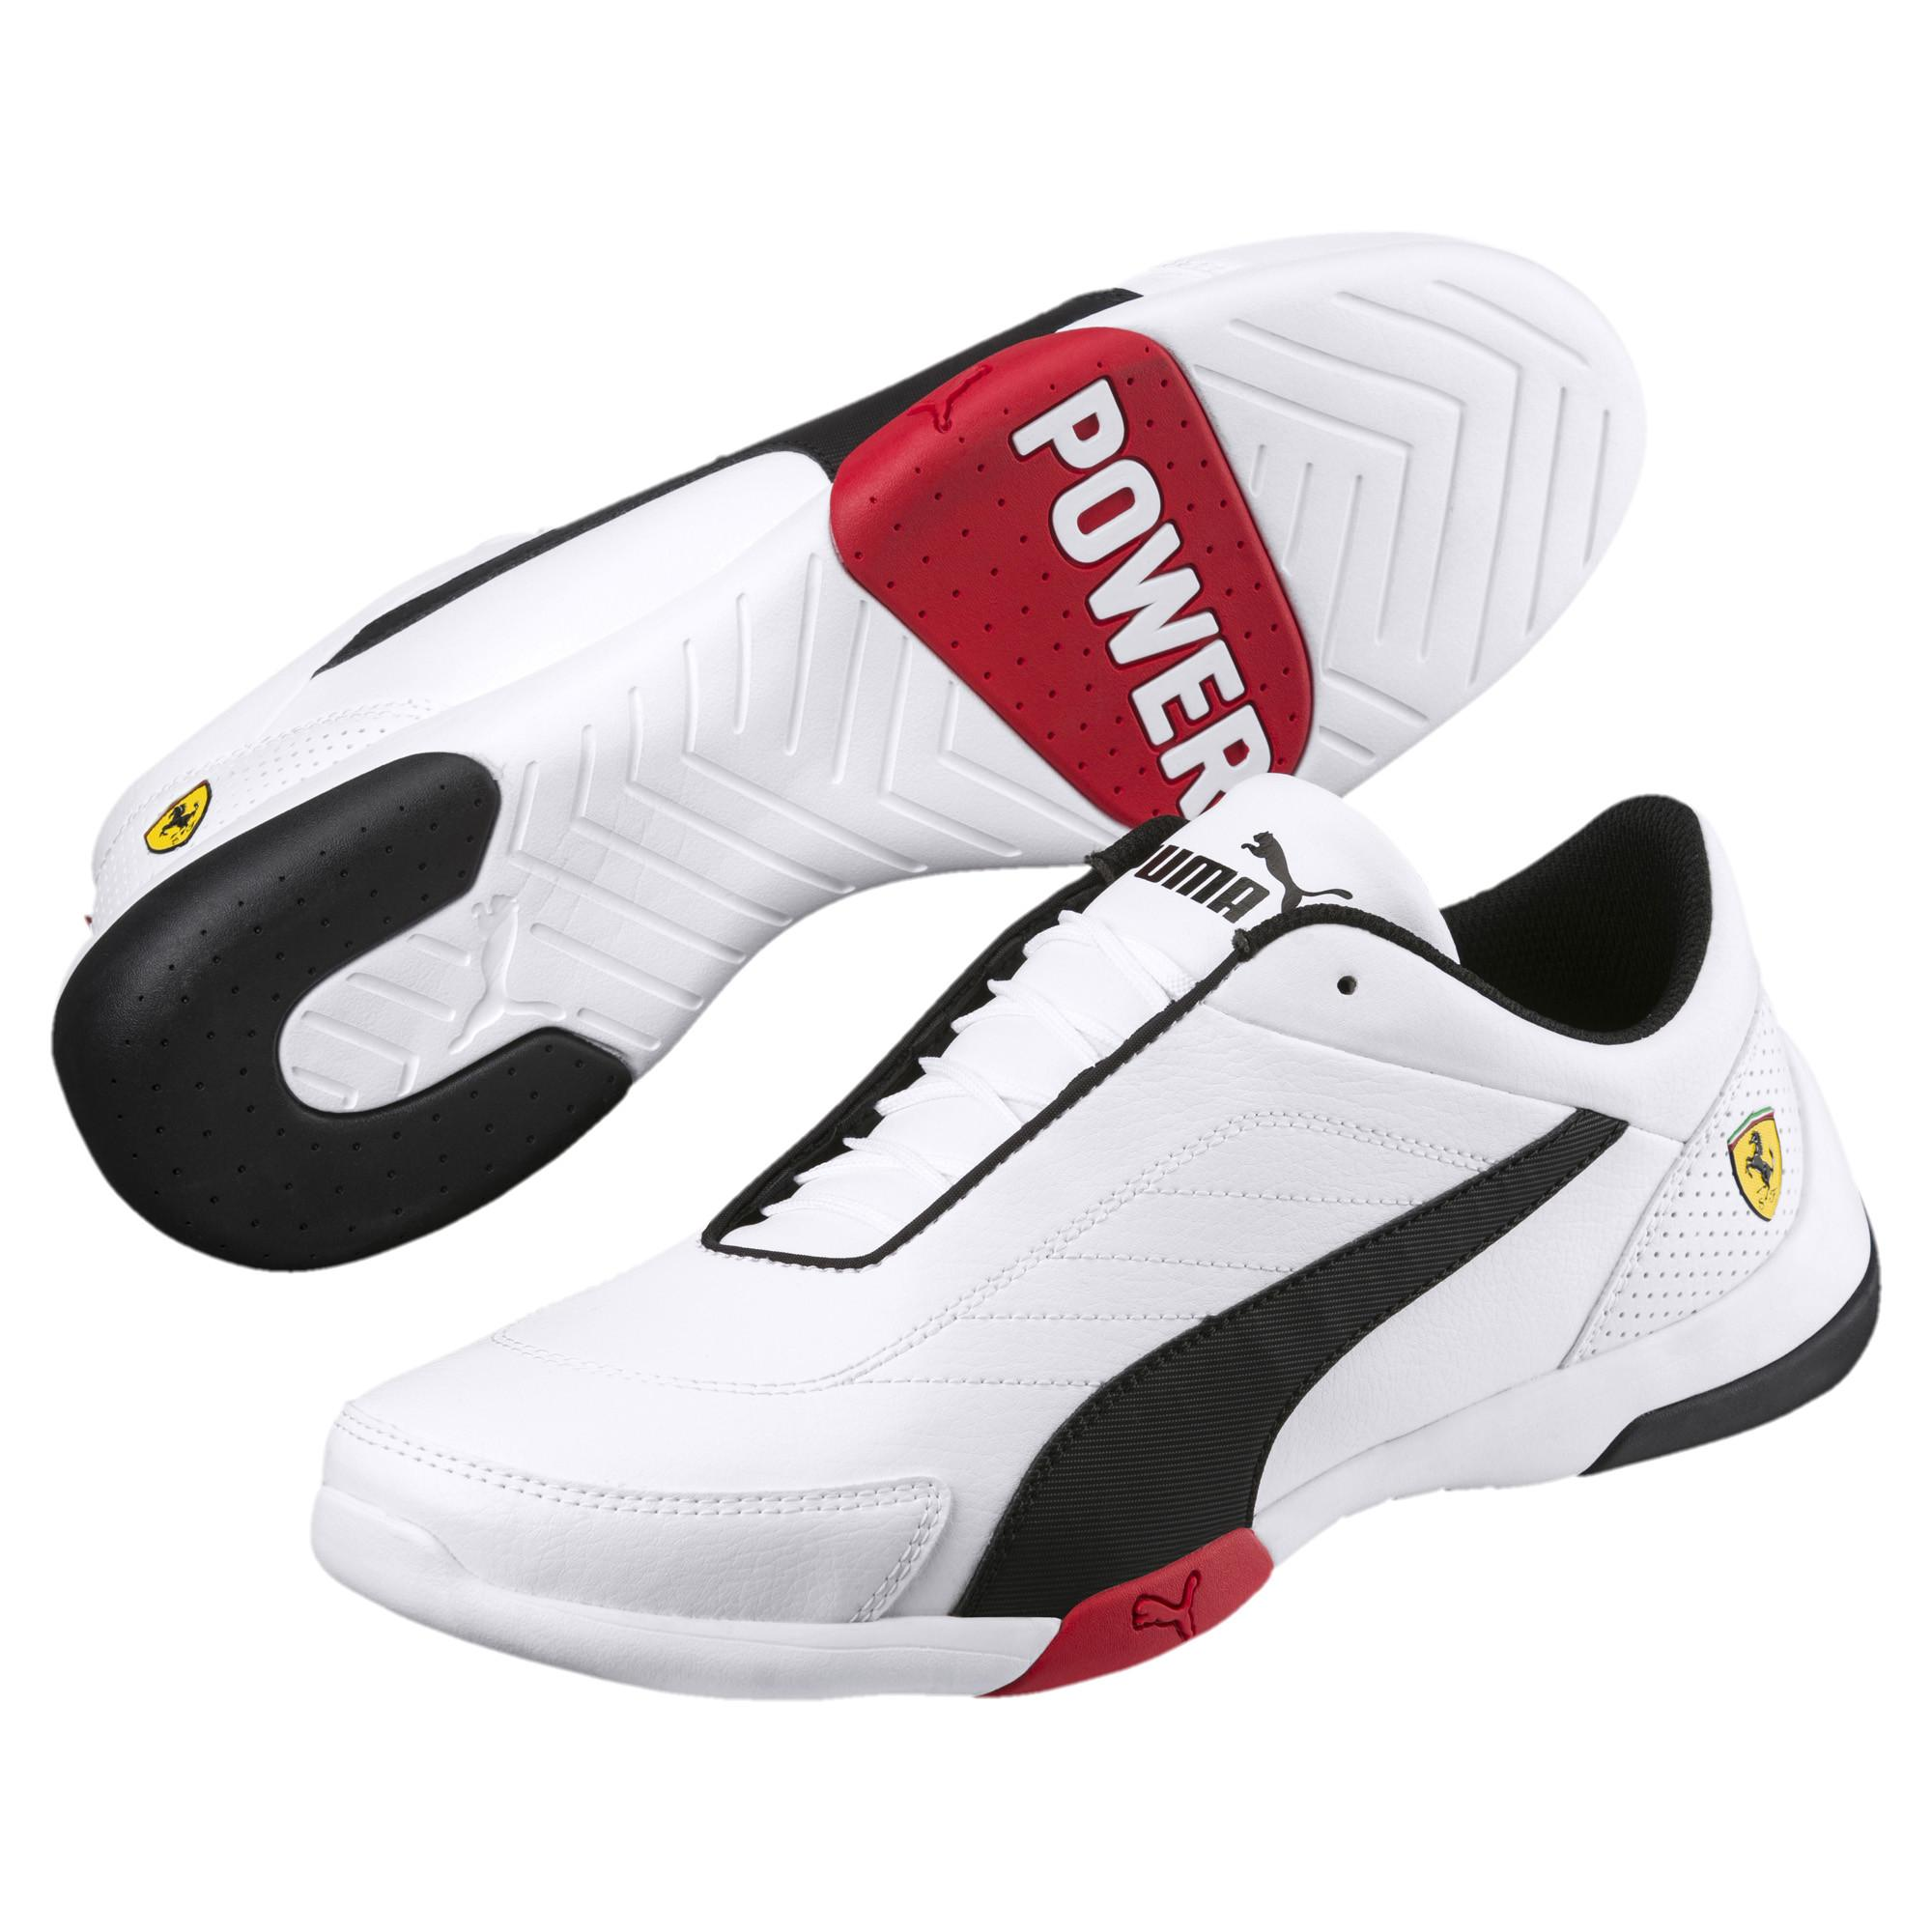 86e693d62bf975 PUMA - White Scuderia Ferrari Kart Cat Iii Sneakers for Men - Lyst. View  fullscreen